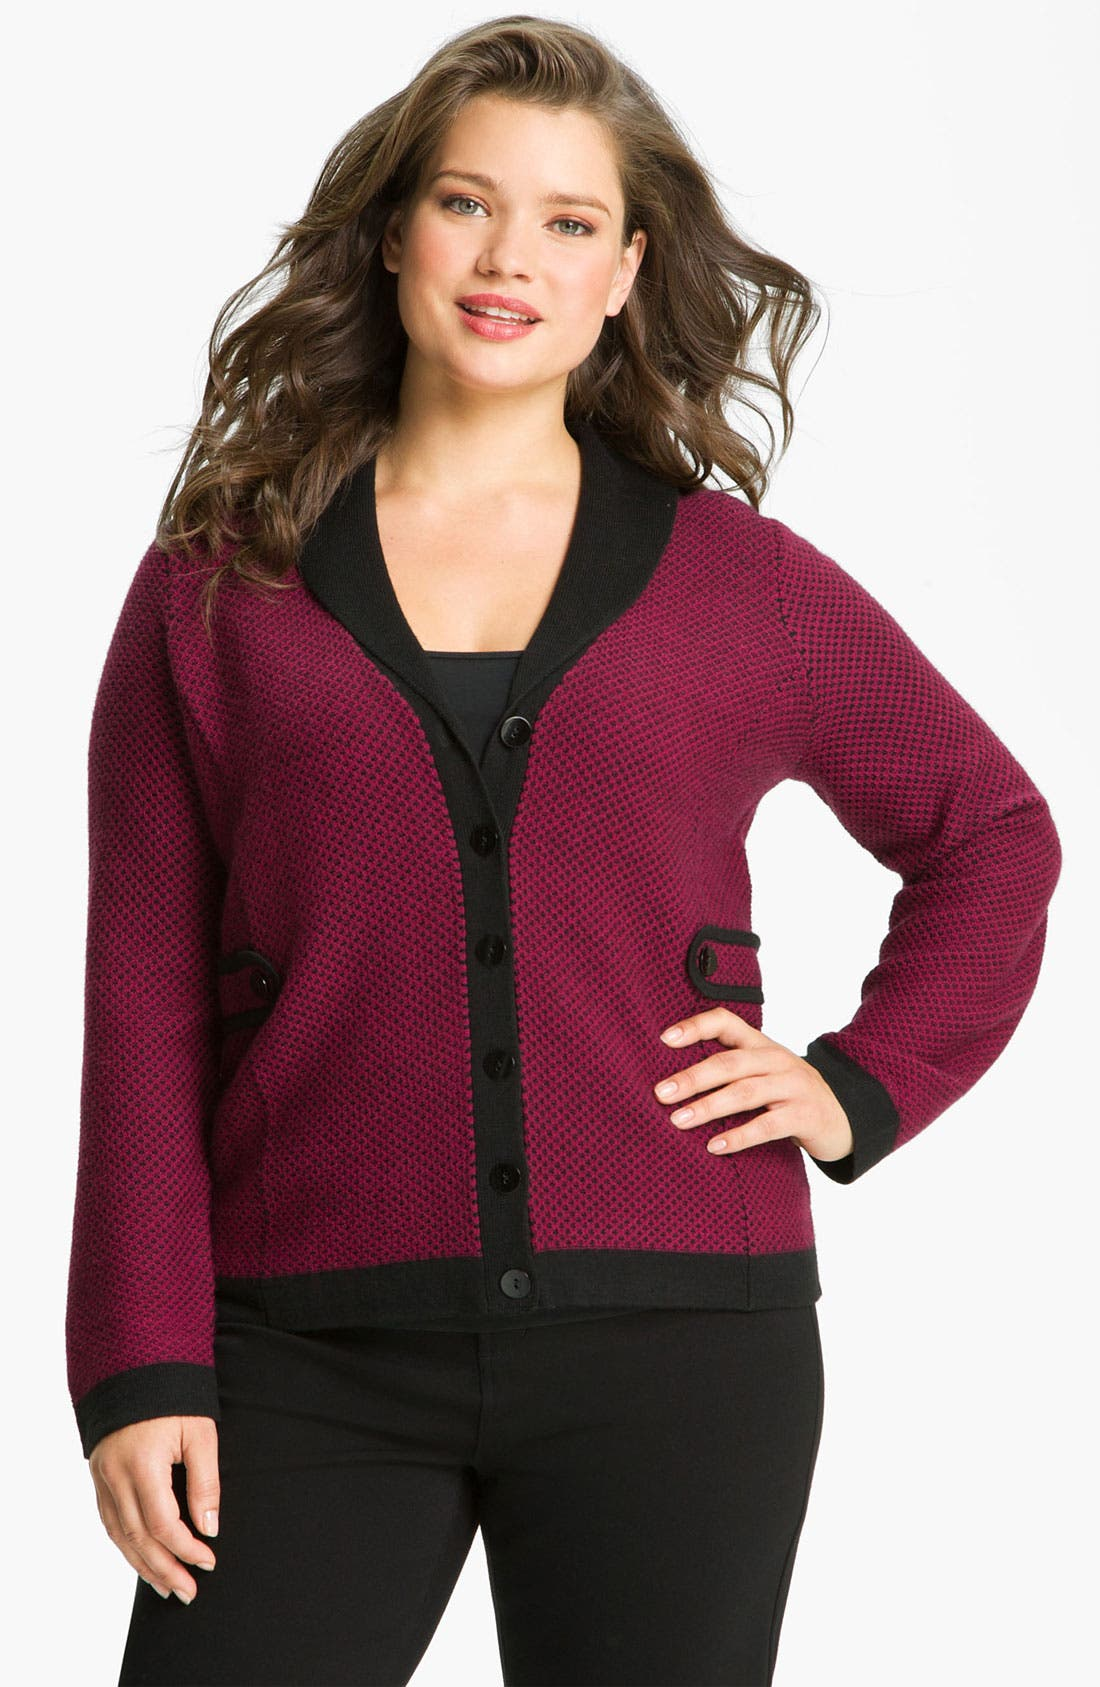 Alternate Image 1 Selected - Sejour Shawl Collar Sweater Jacket (Plus)